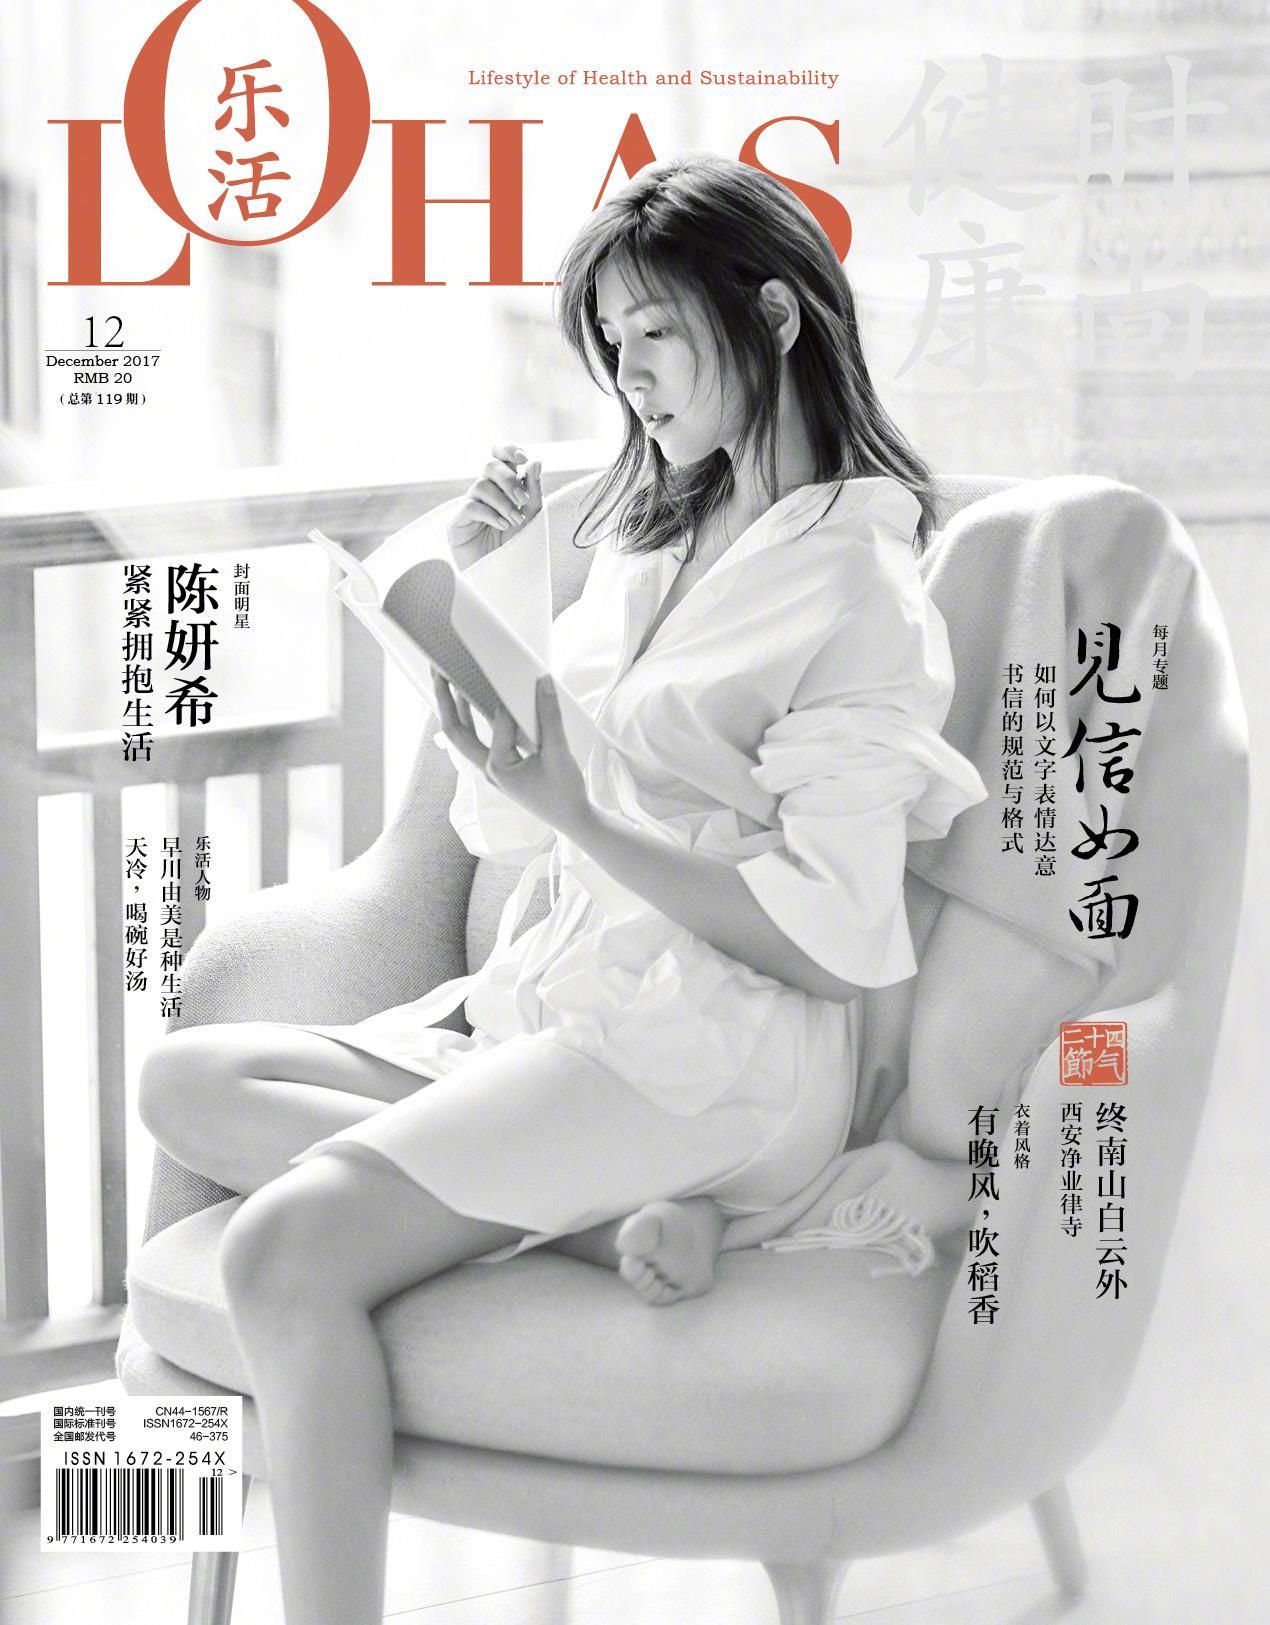 《LOHAS乐活》杂志十二月刊 美美的陈妍希 当了妈妈依旧少女感十足,《LOHAS乐活》杂志十二月刊 美美的陈妍希 当了妈妈依旧少女感十足